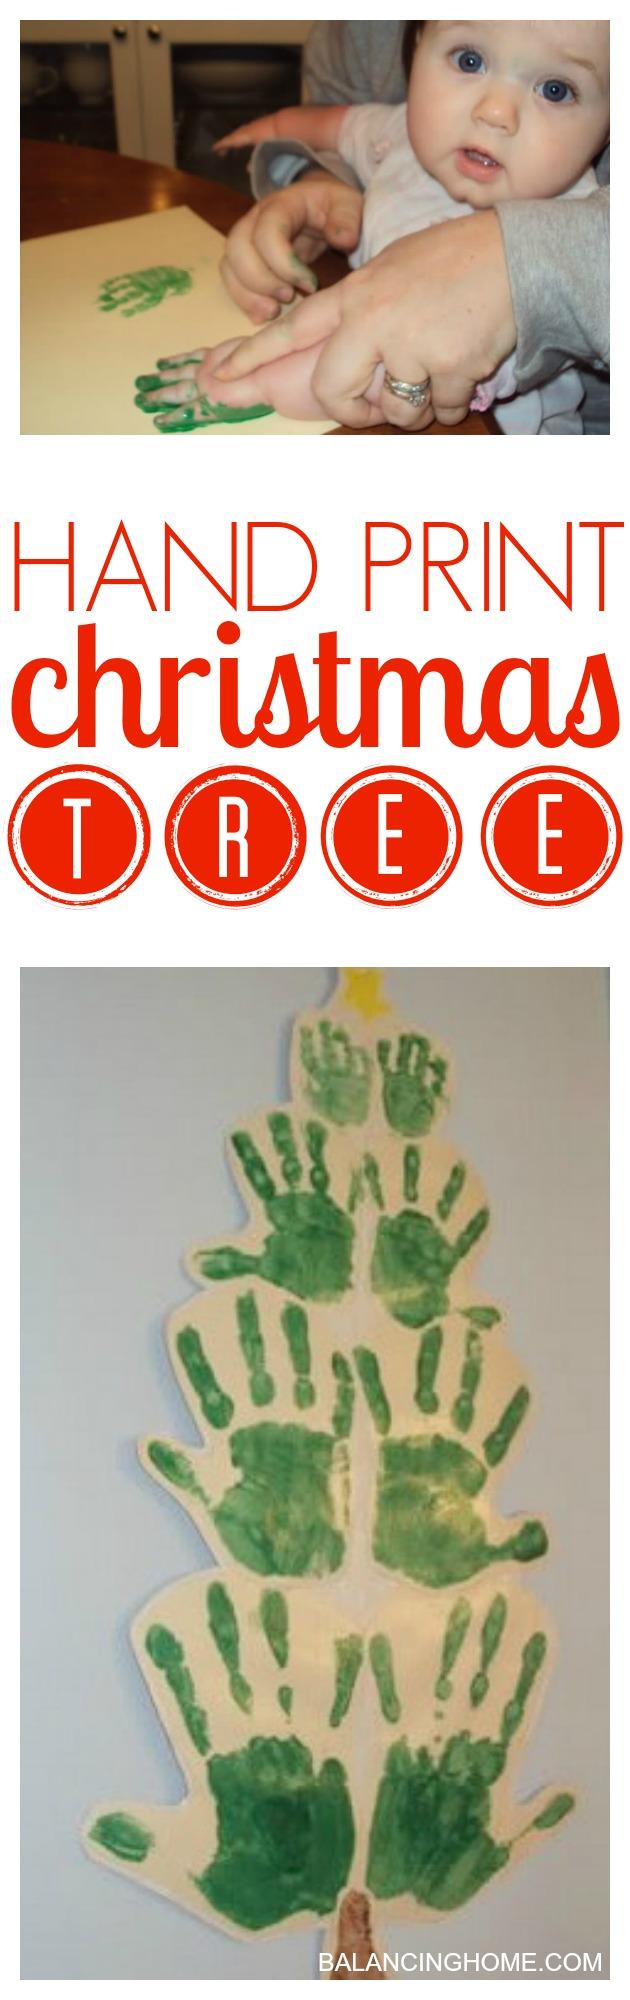 hand print Christmas tree- a super fun family Holiday craft.